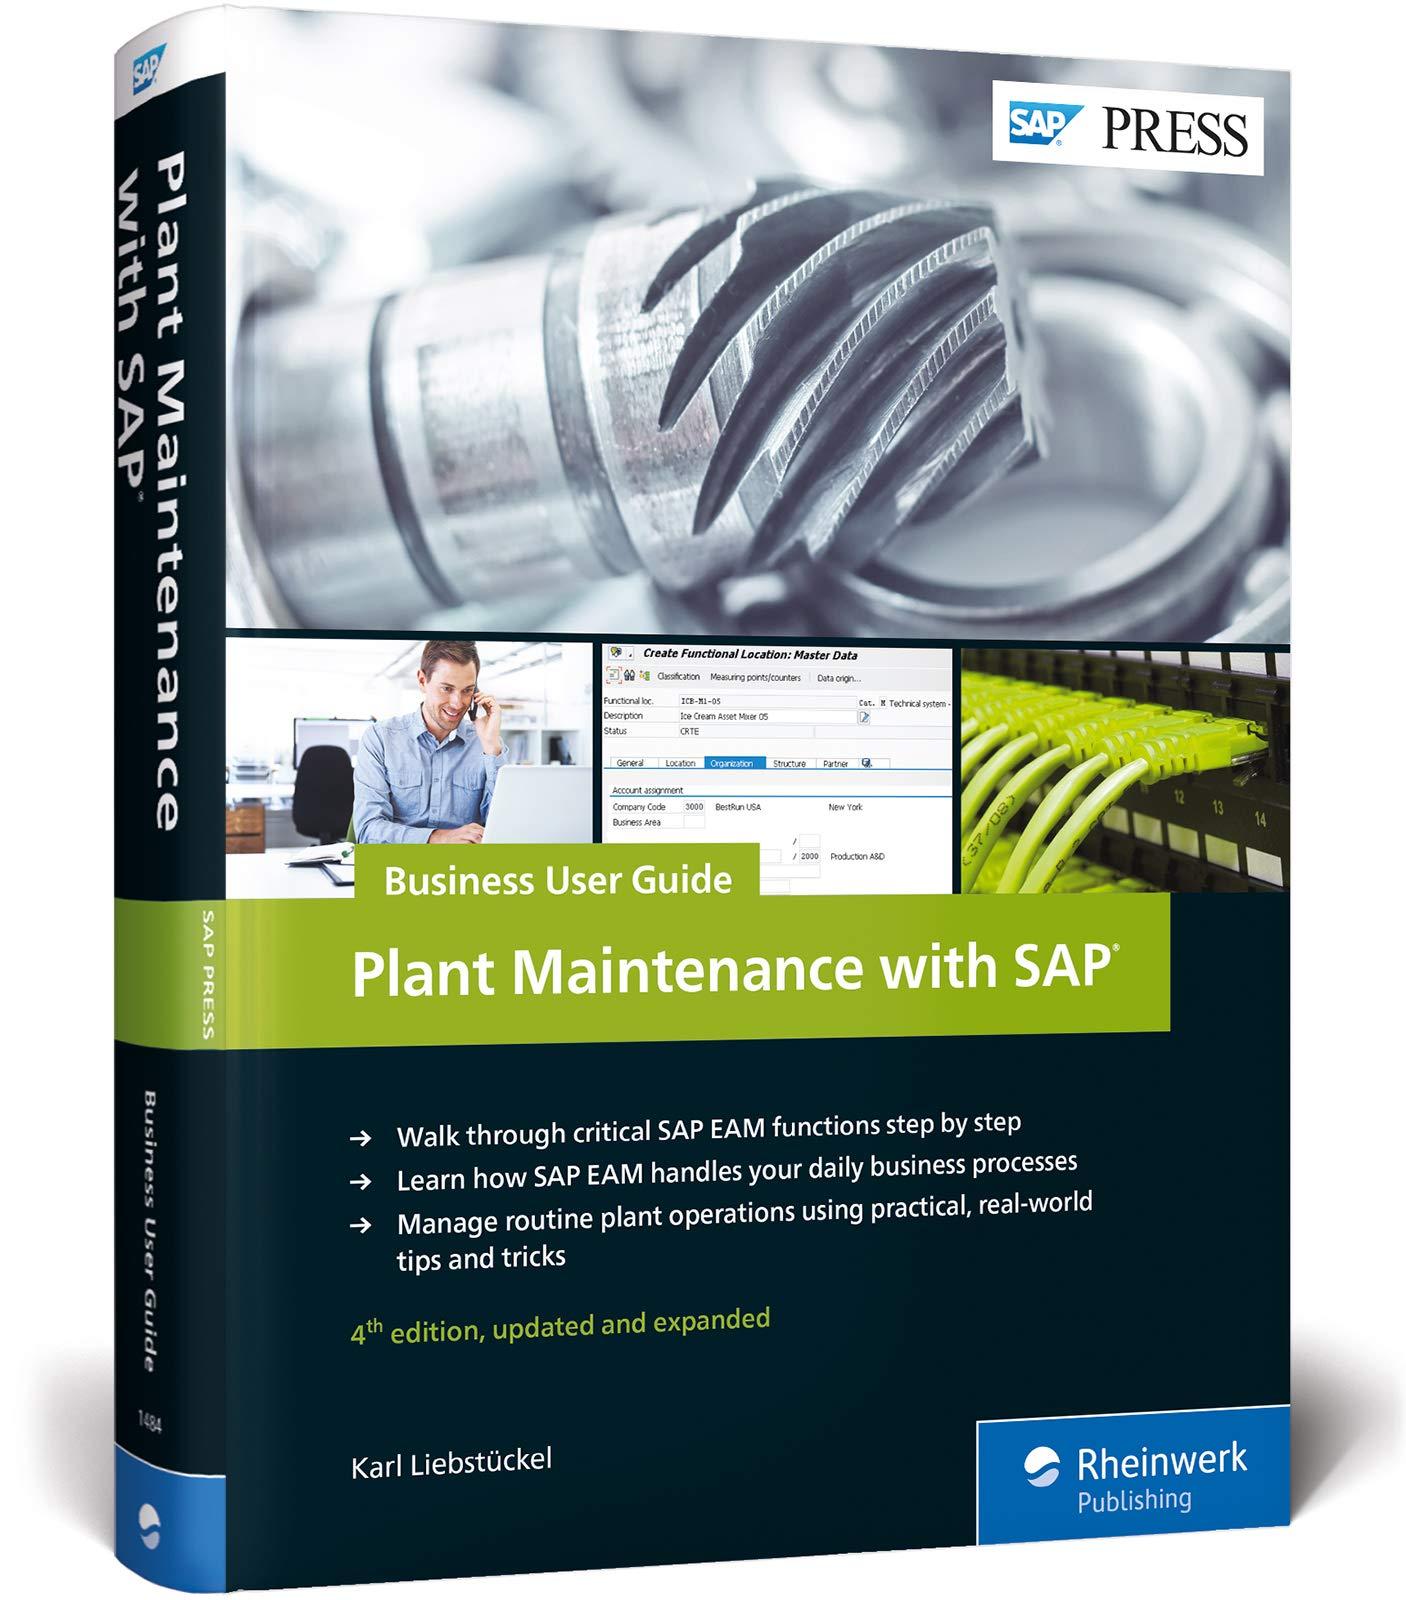 Investment management sap pdf manuals como operar forex